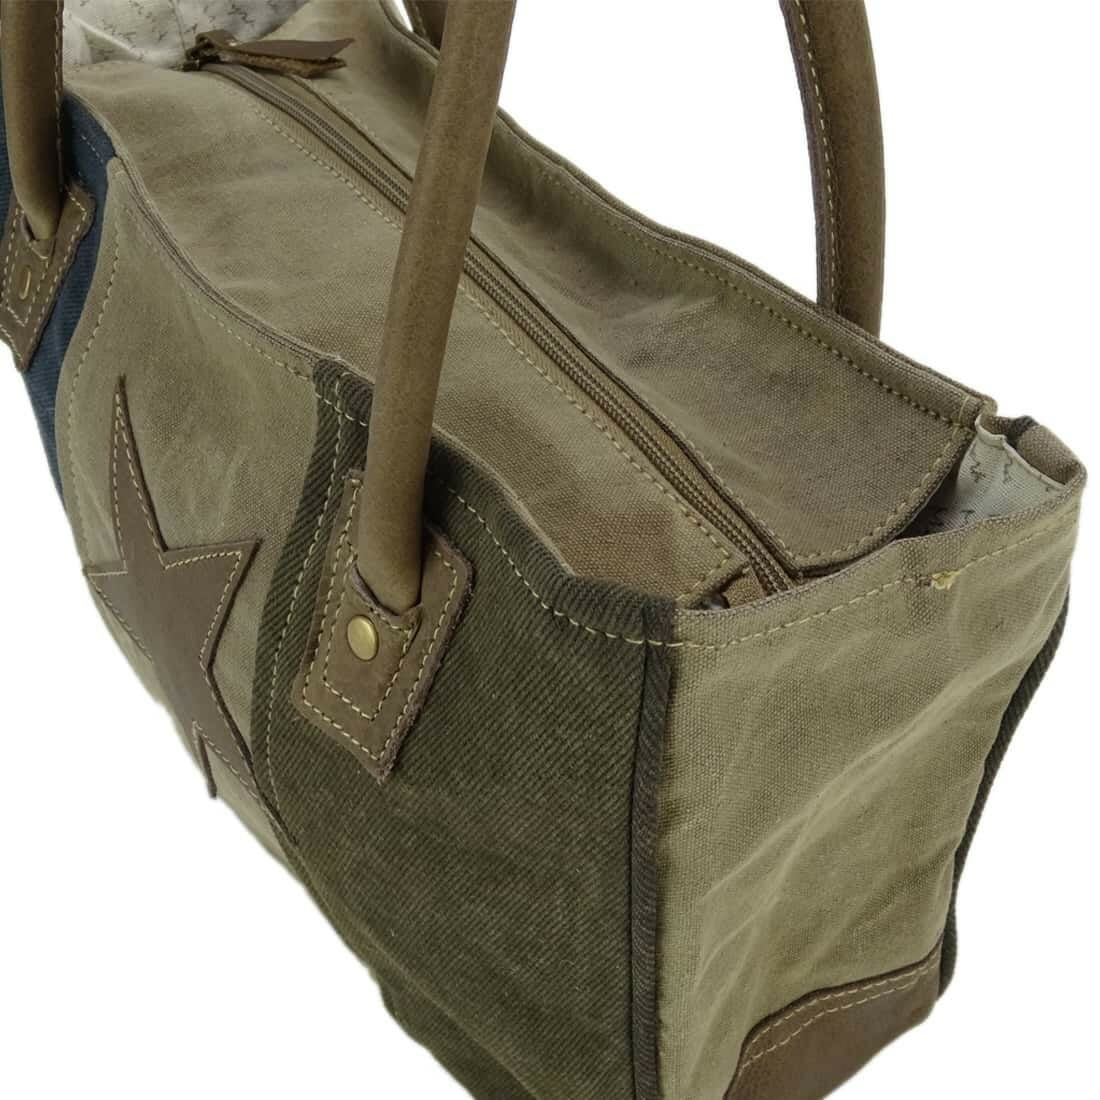 Myra Bag Handtas Stella detail2